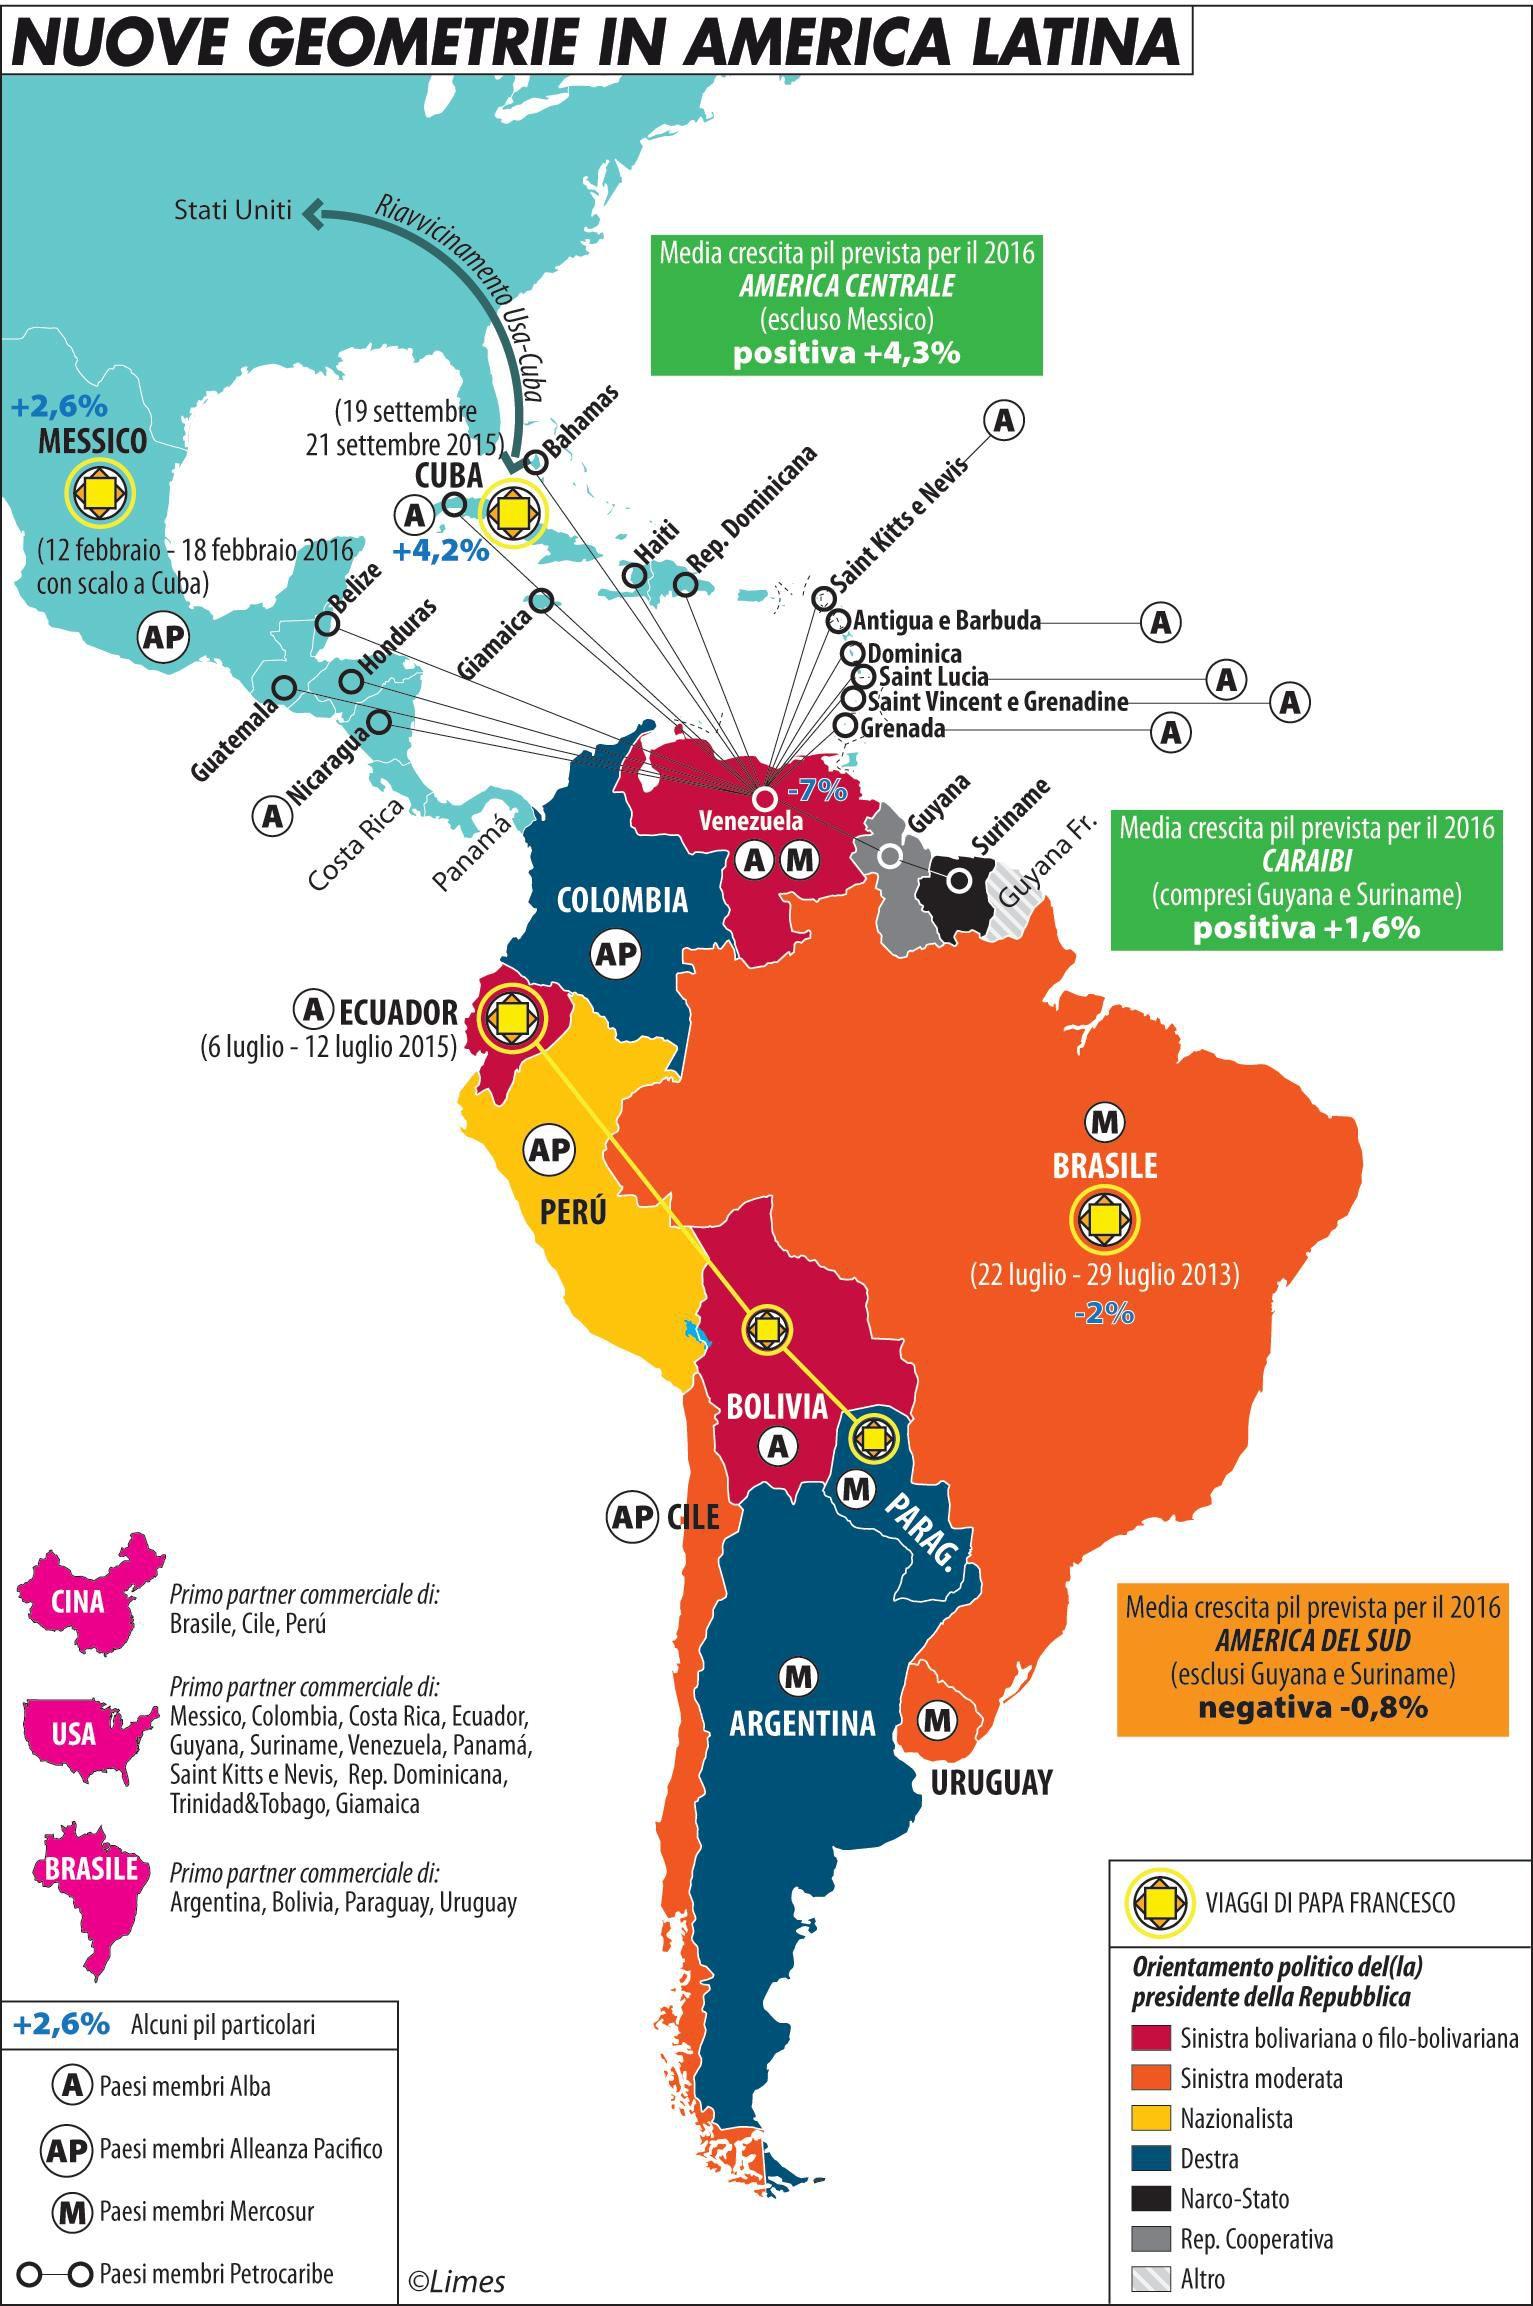 geometrie latinoamericane